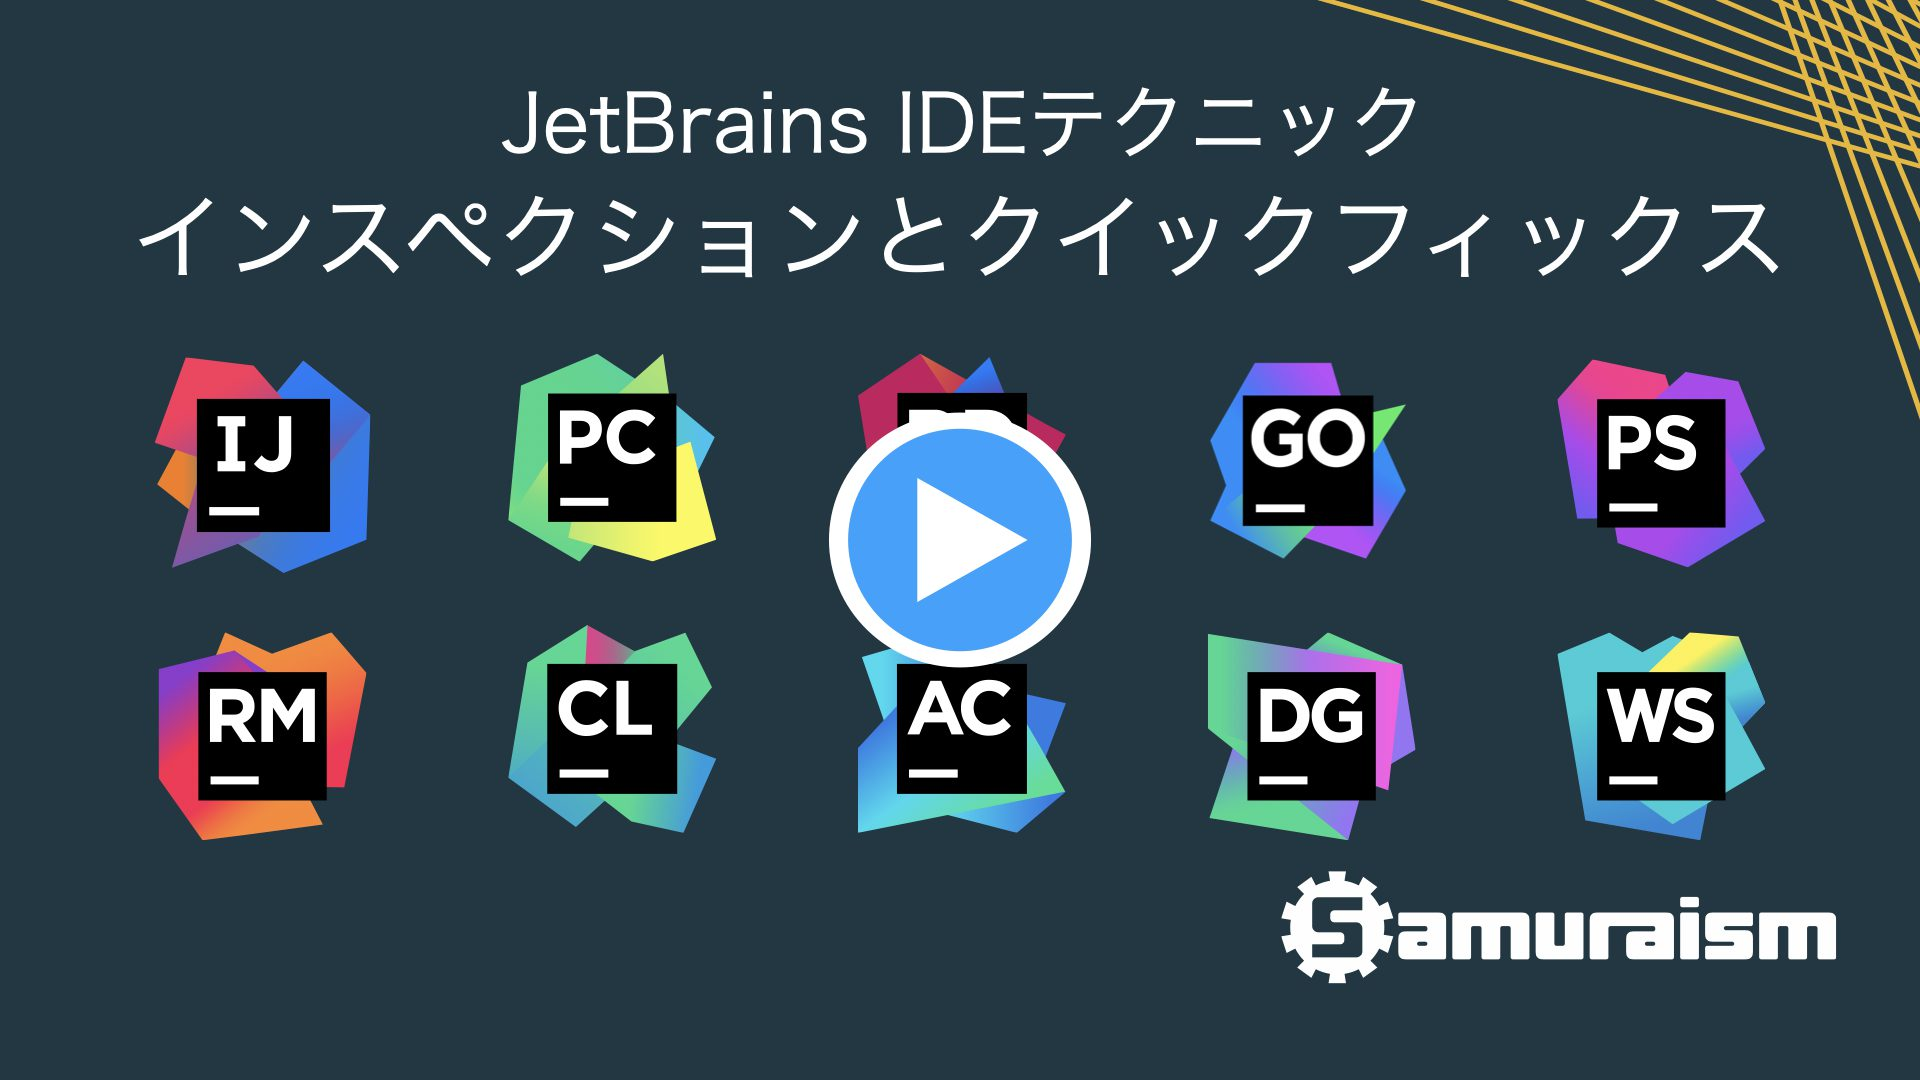 #JetBrainsIDEテクニック – インスペクションとクイックフィックス